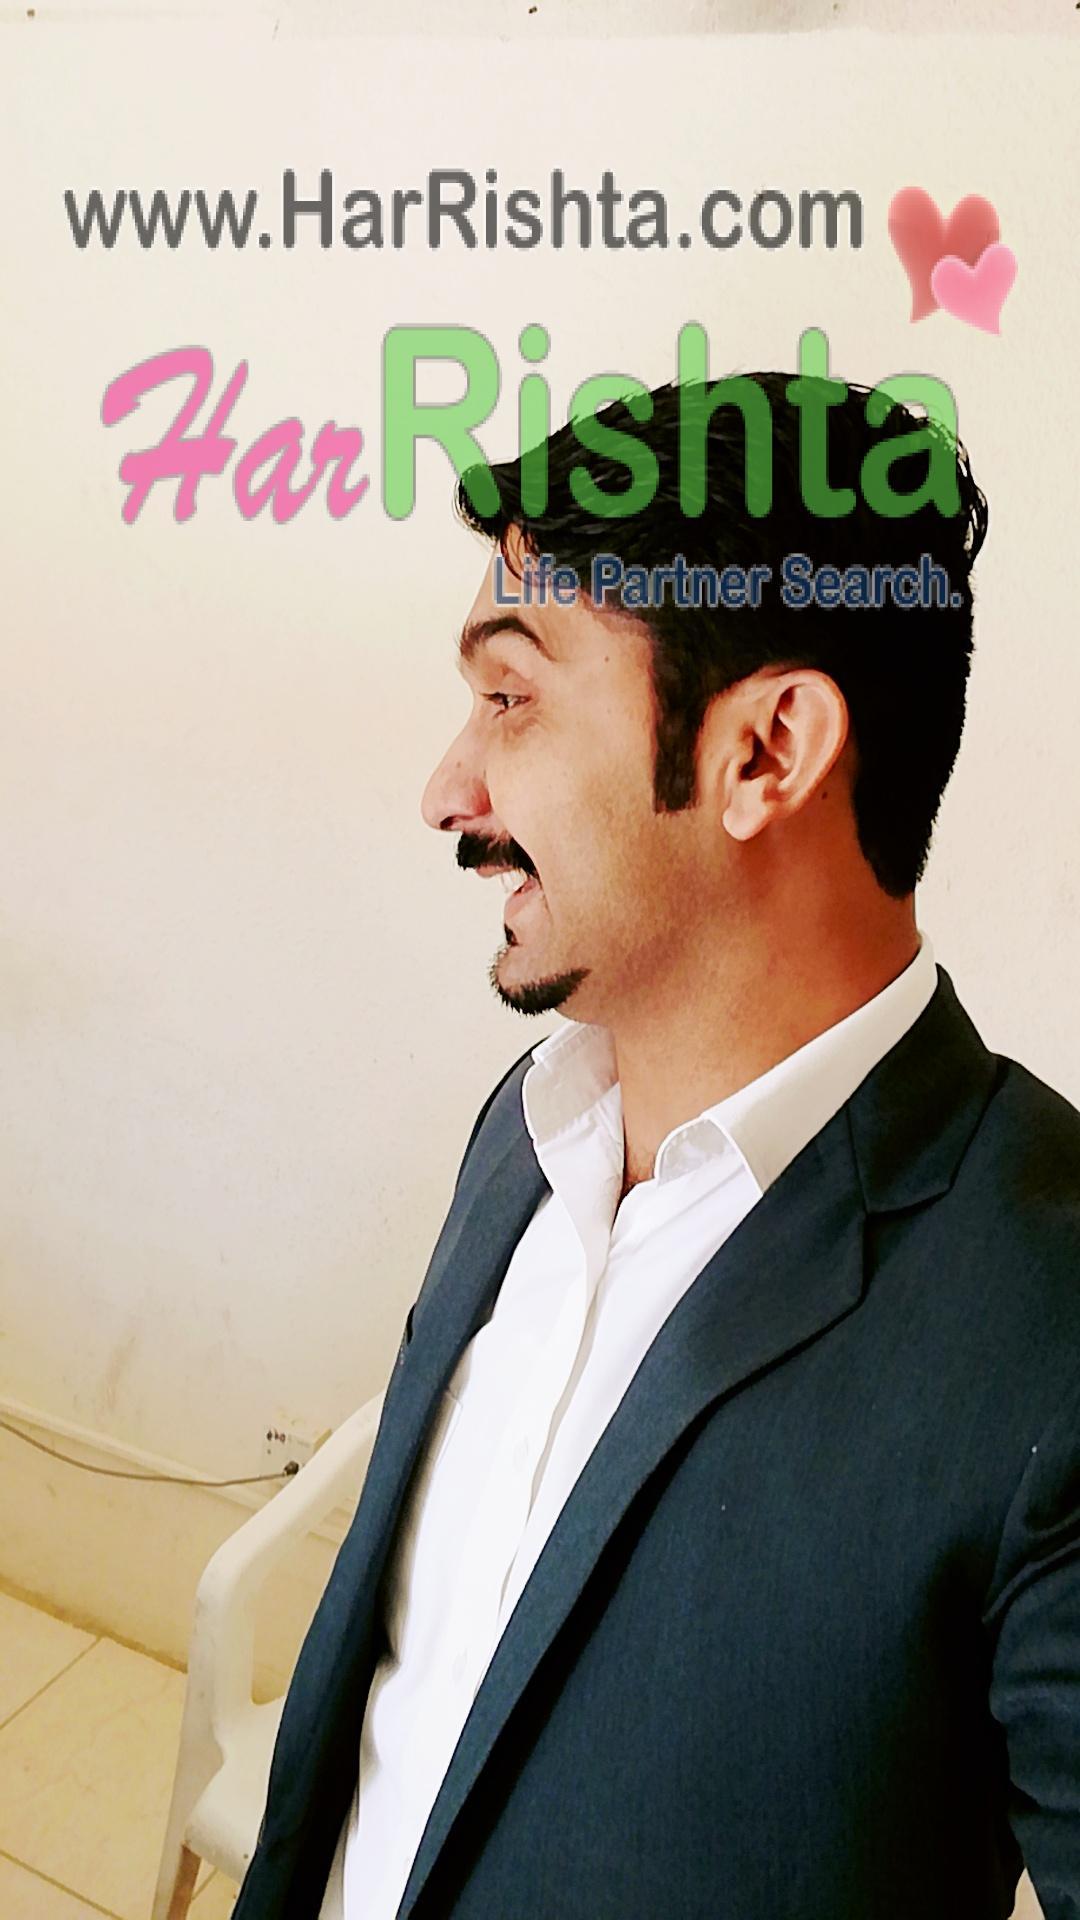 Johiya Boy Rishta in Lahore